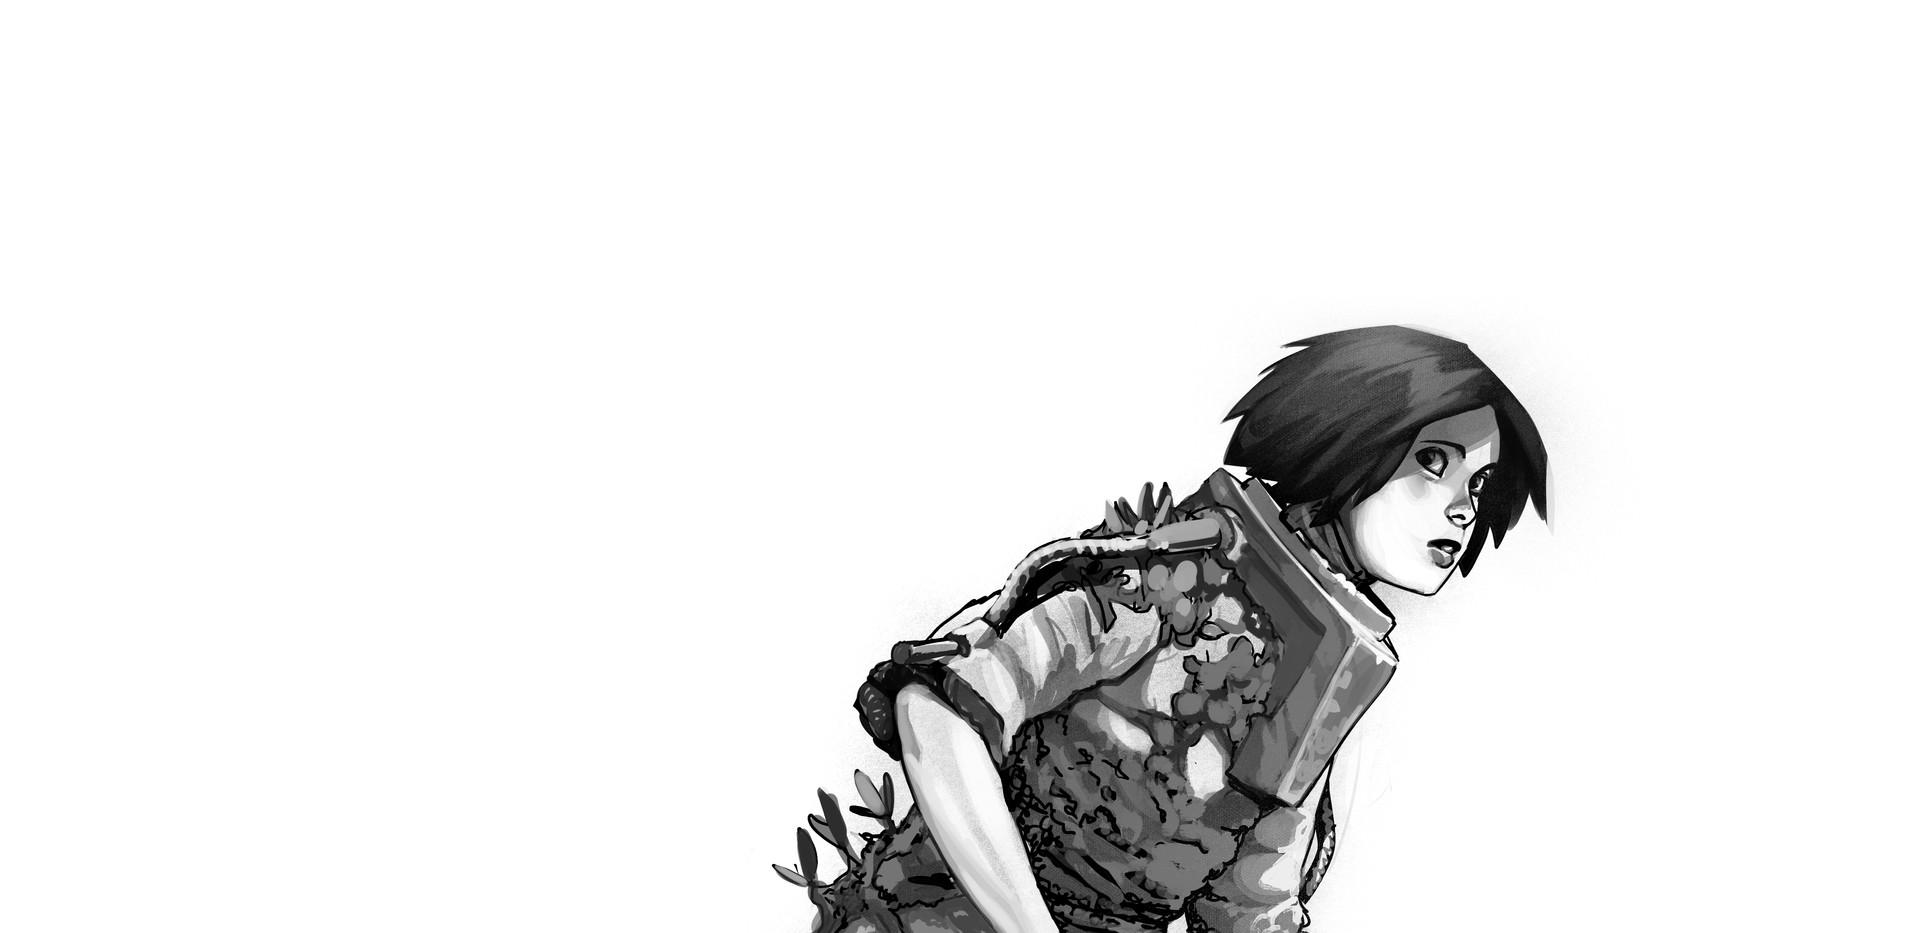 character_loose_ops.jpg